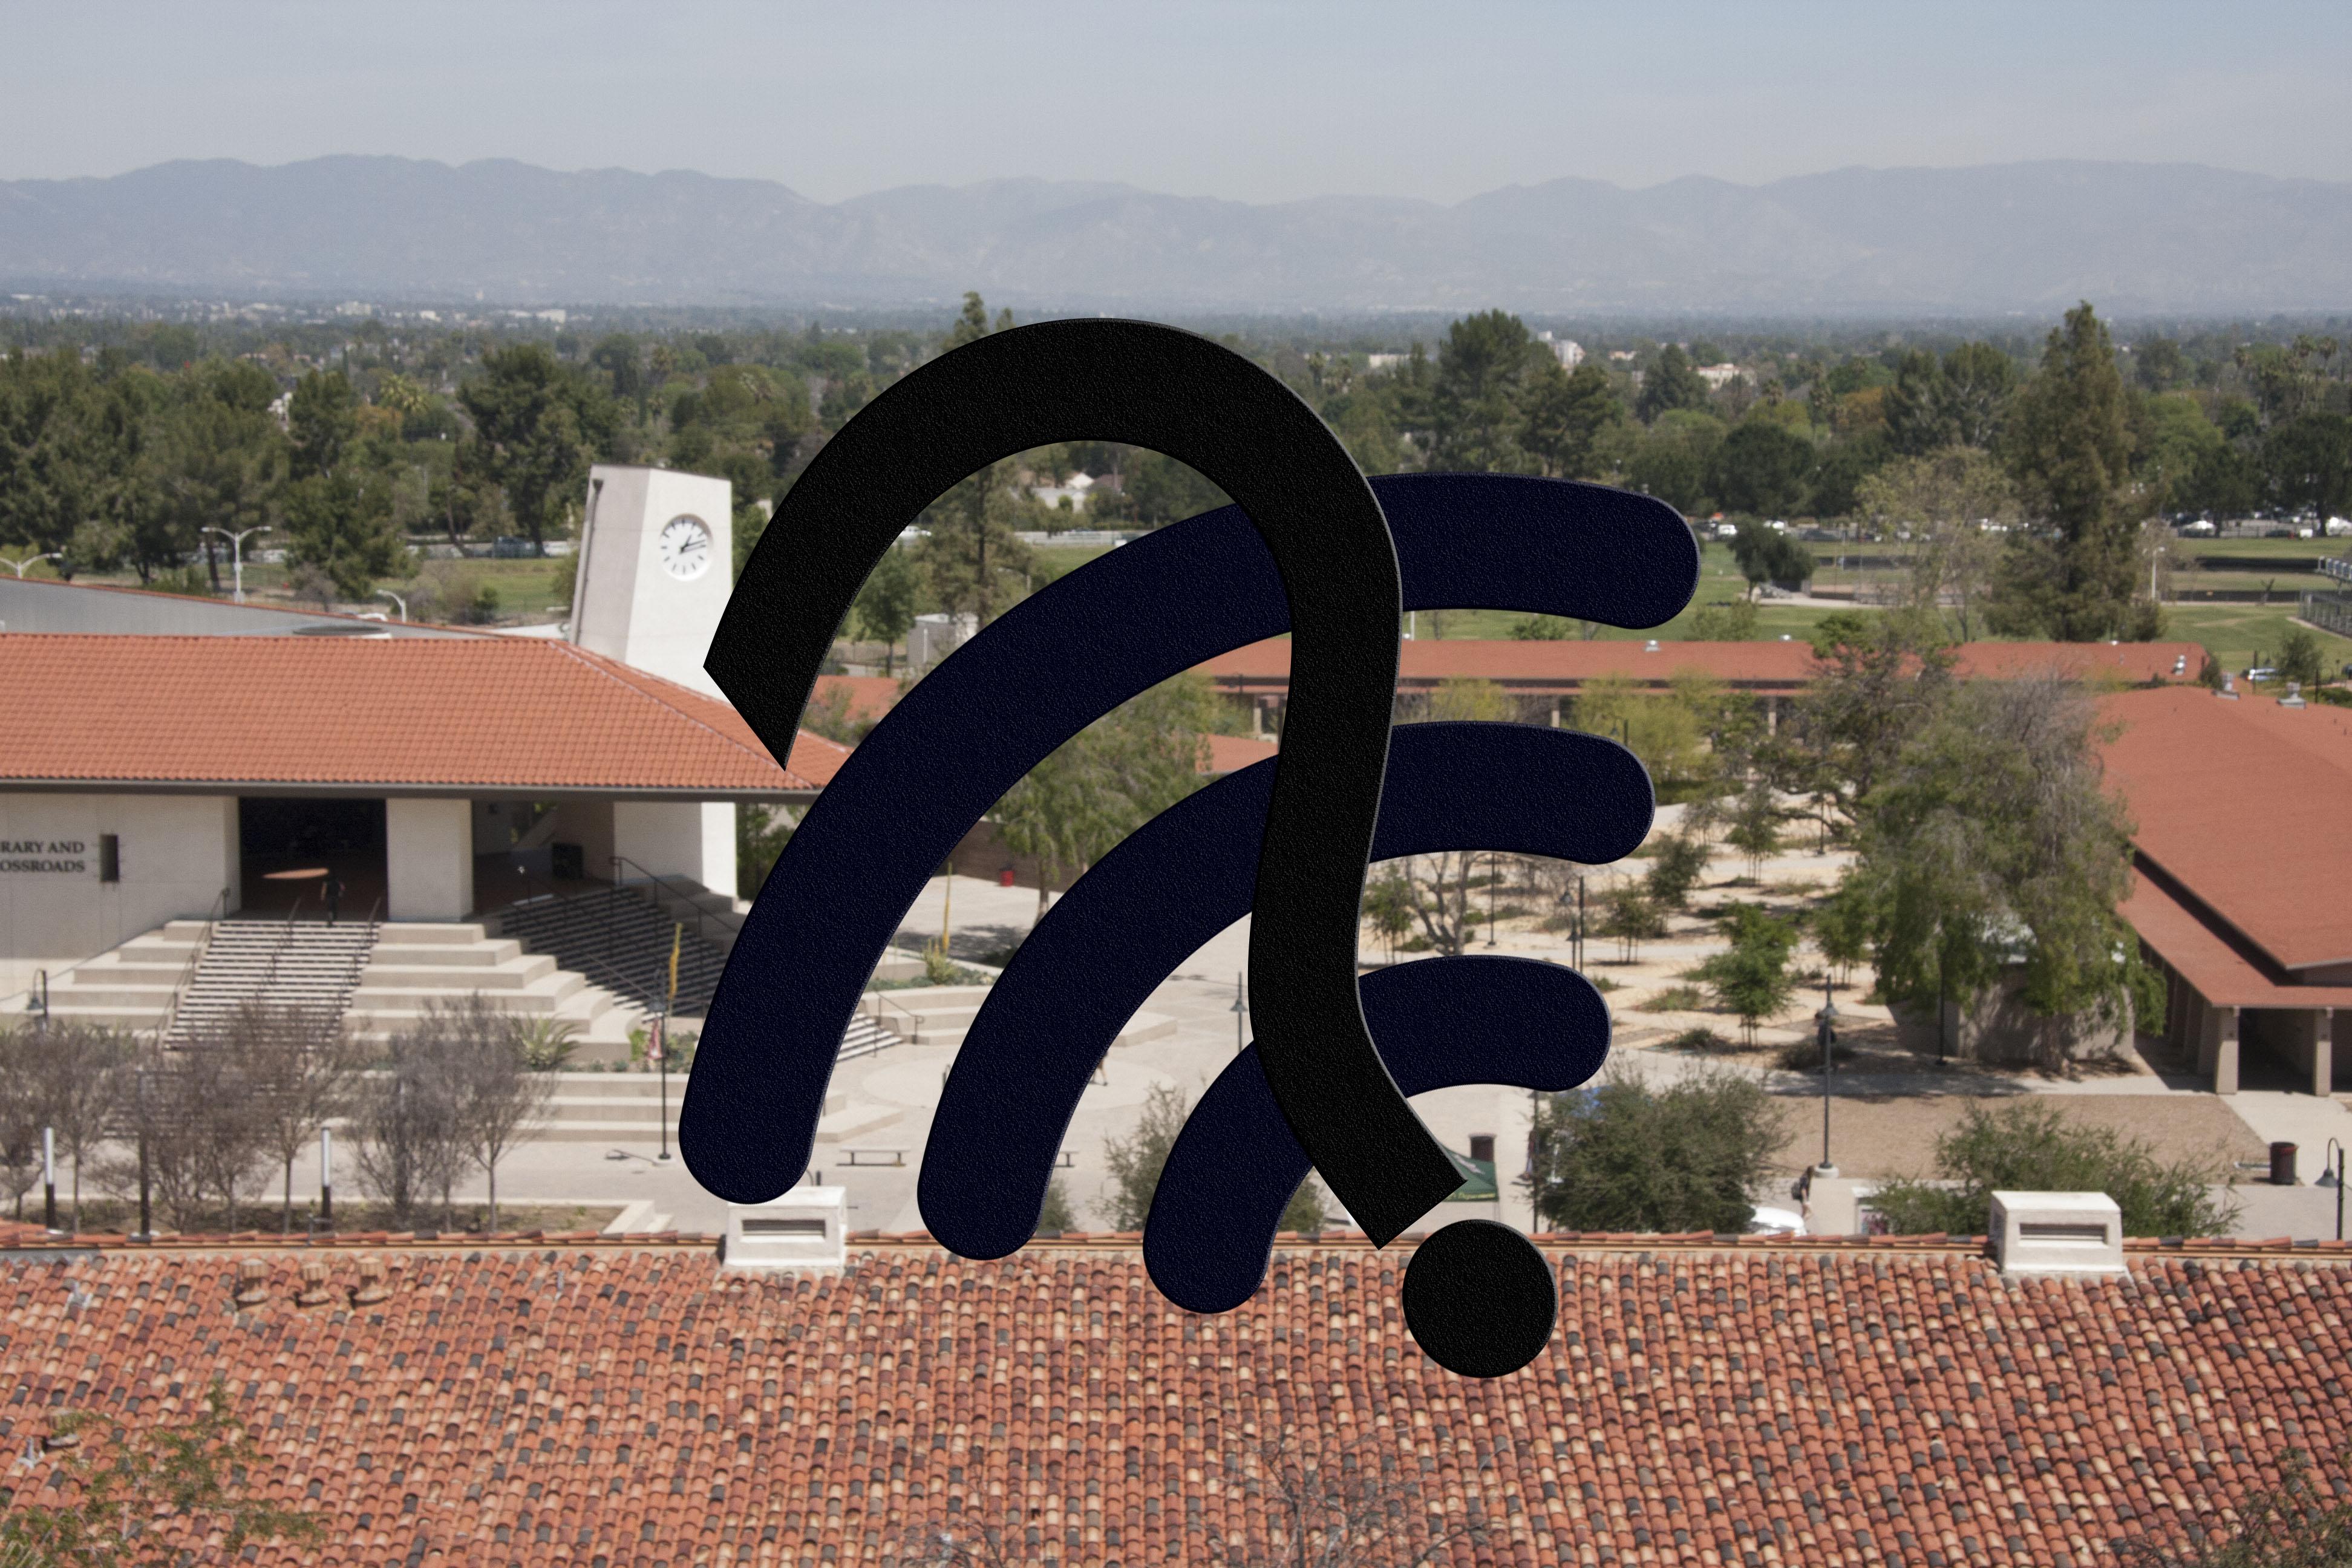 Wi-Fi woes